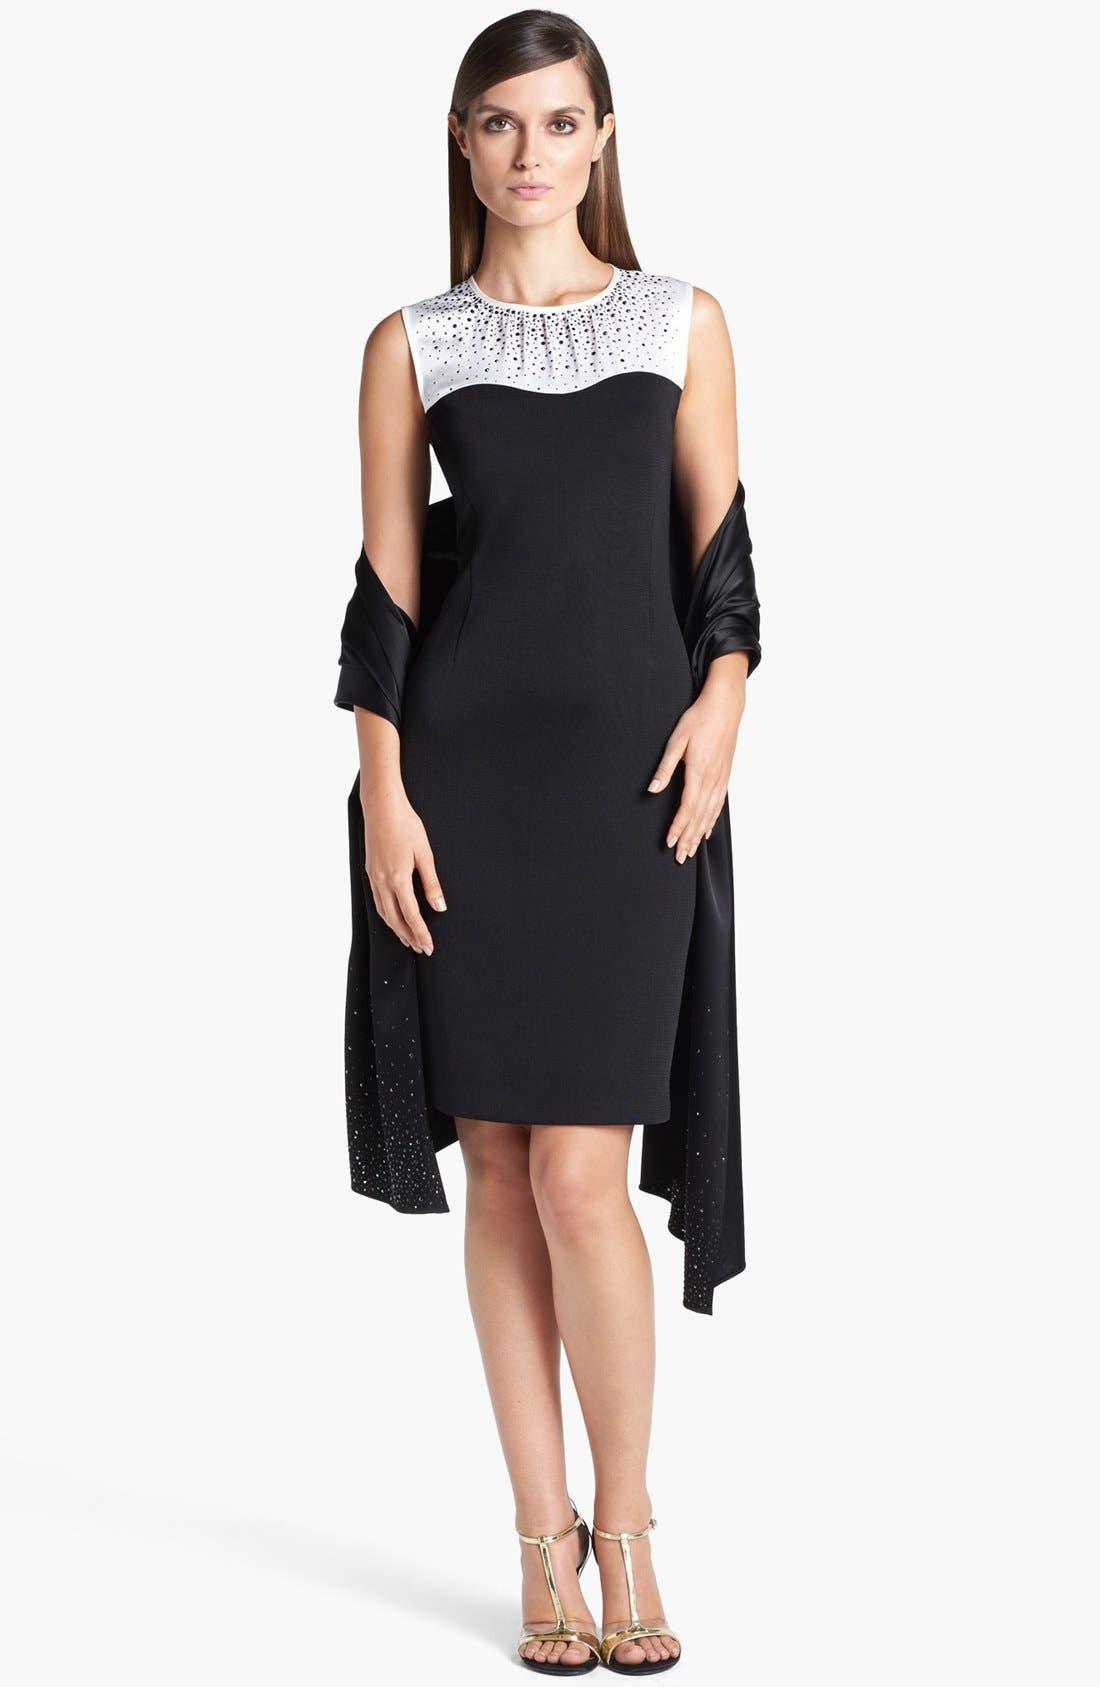 Main Image - St. John Collection Satin Yoke Milano Knit Sheath Dress